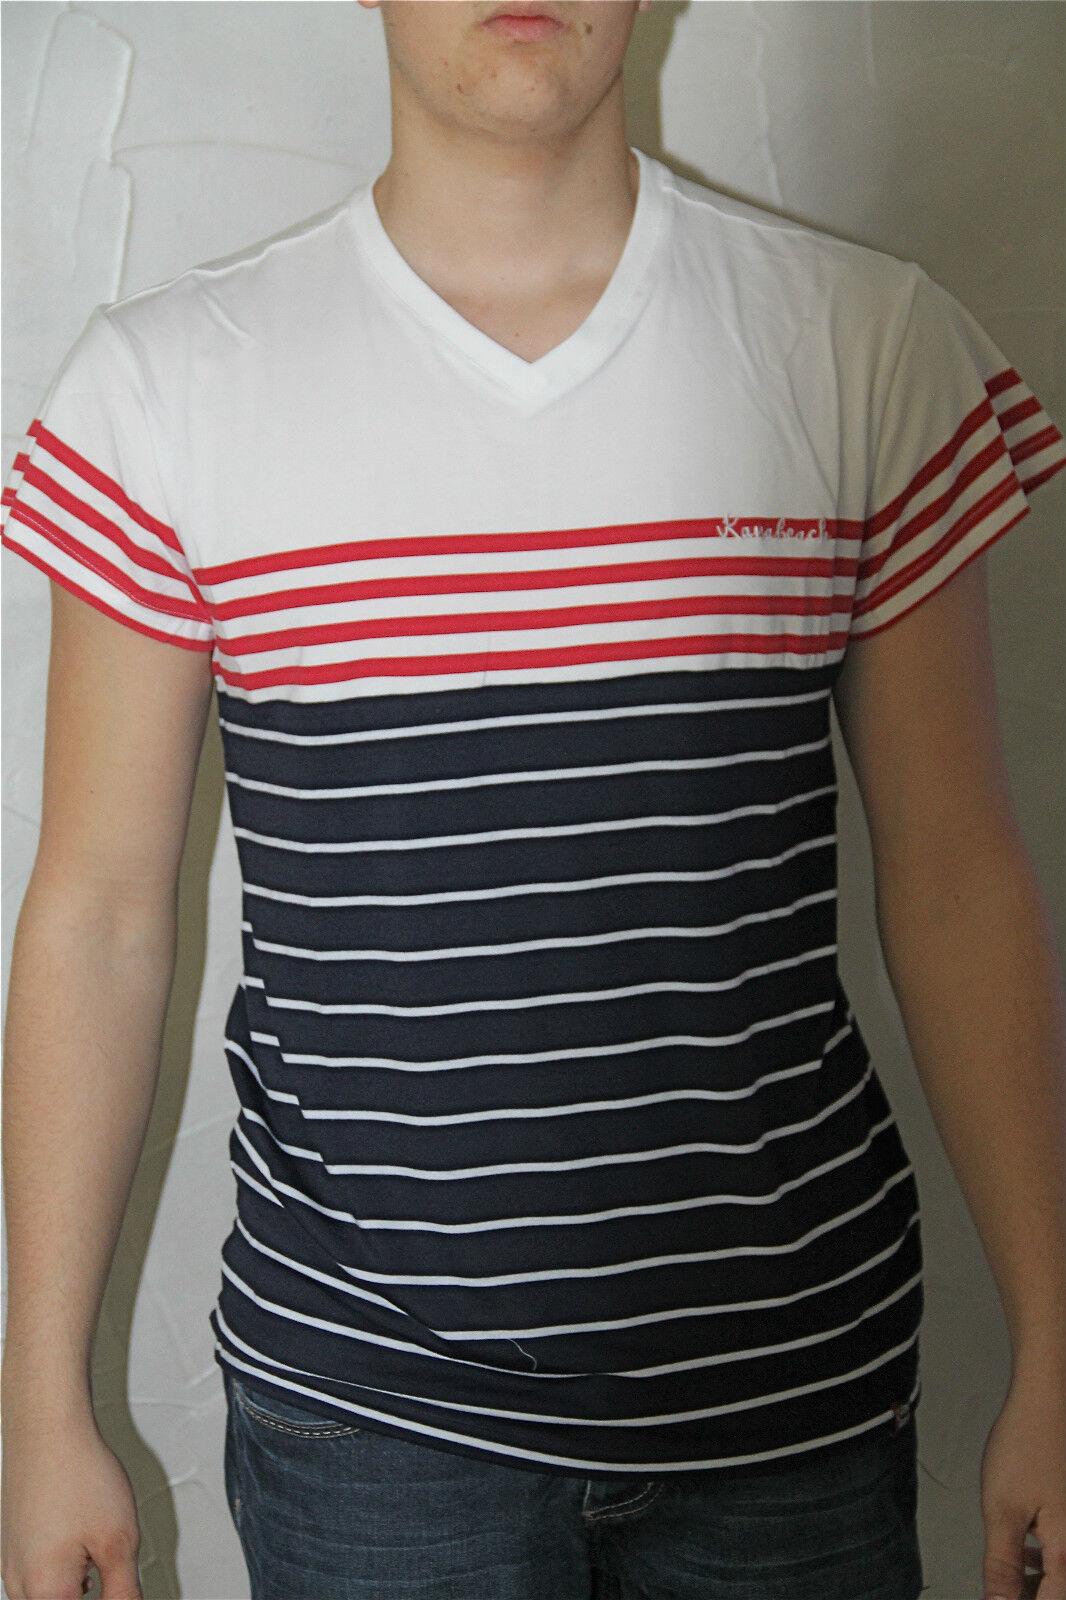 T-shirt KANABEACH bini-ry SIZE M NEW LABEL value